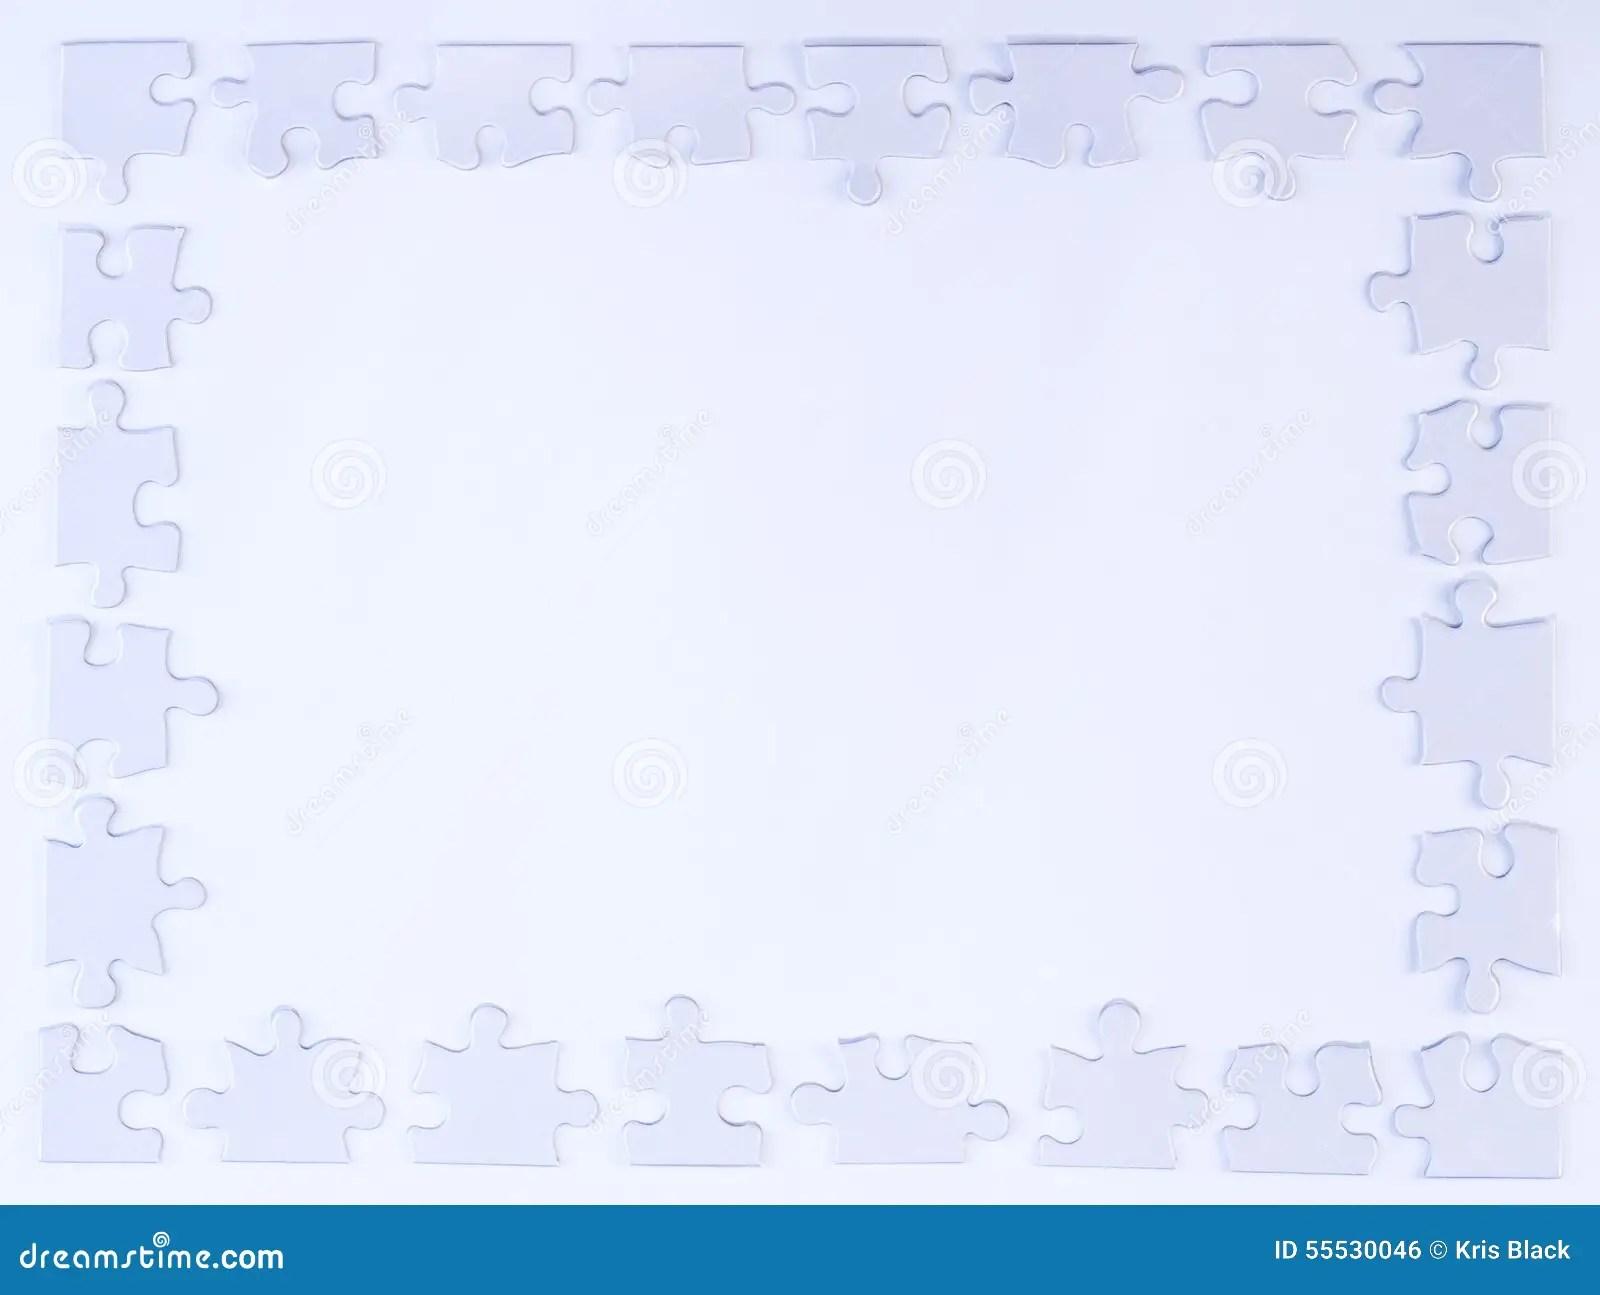 White Puzzle Piece Border Stock Photo